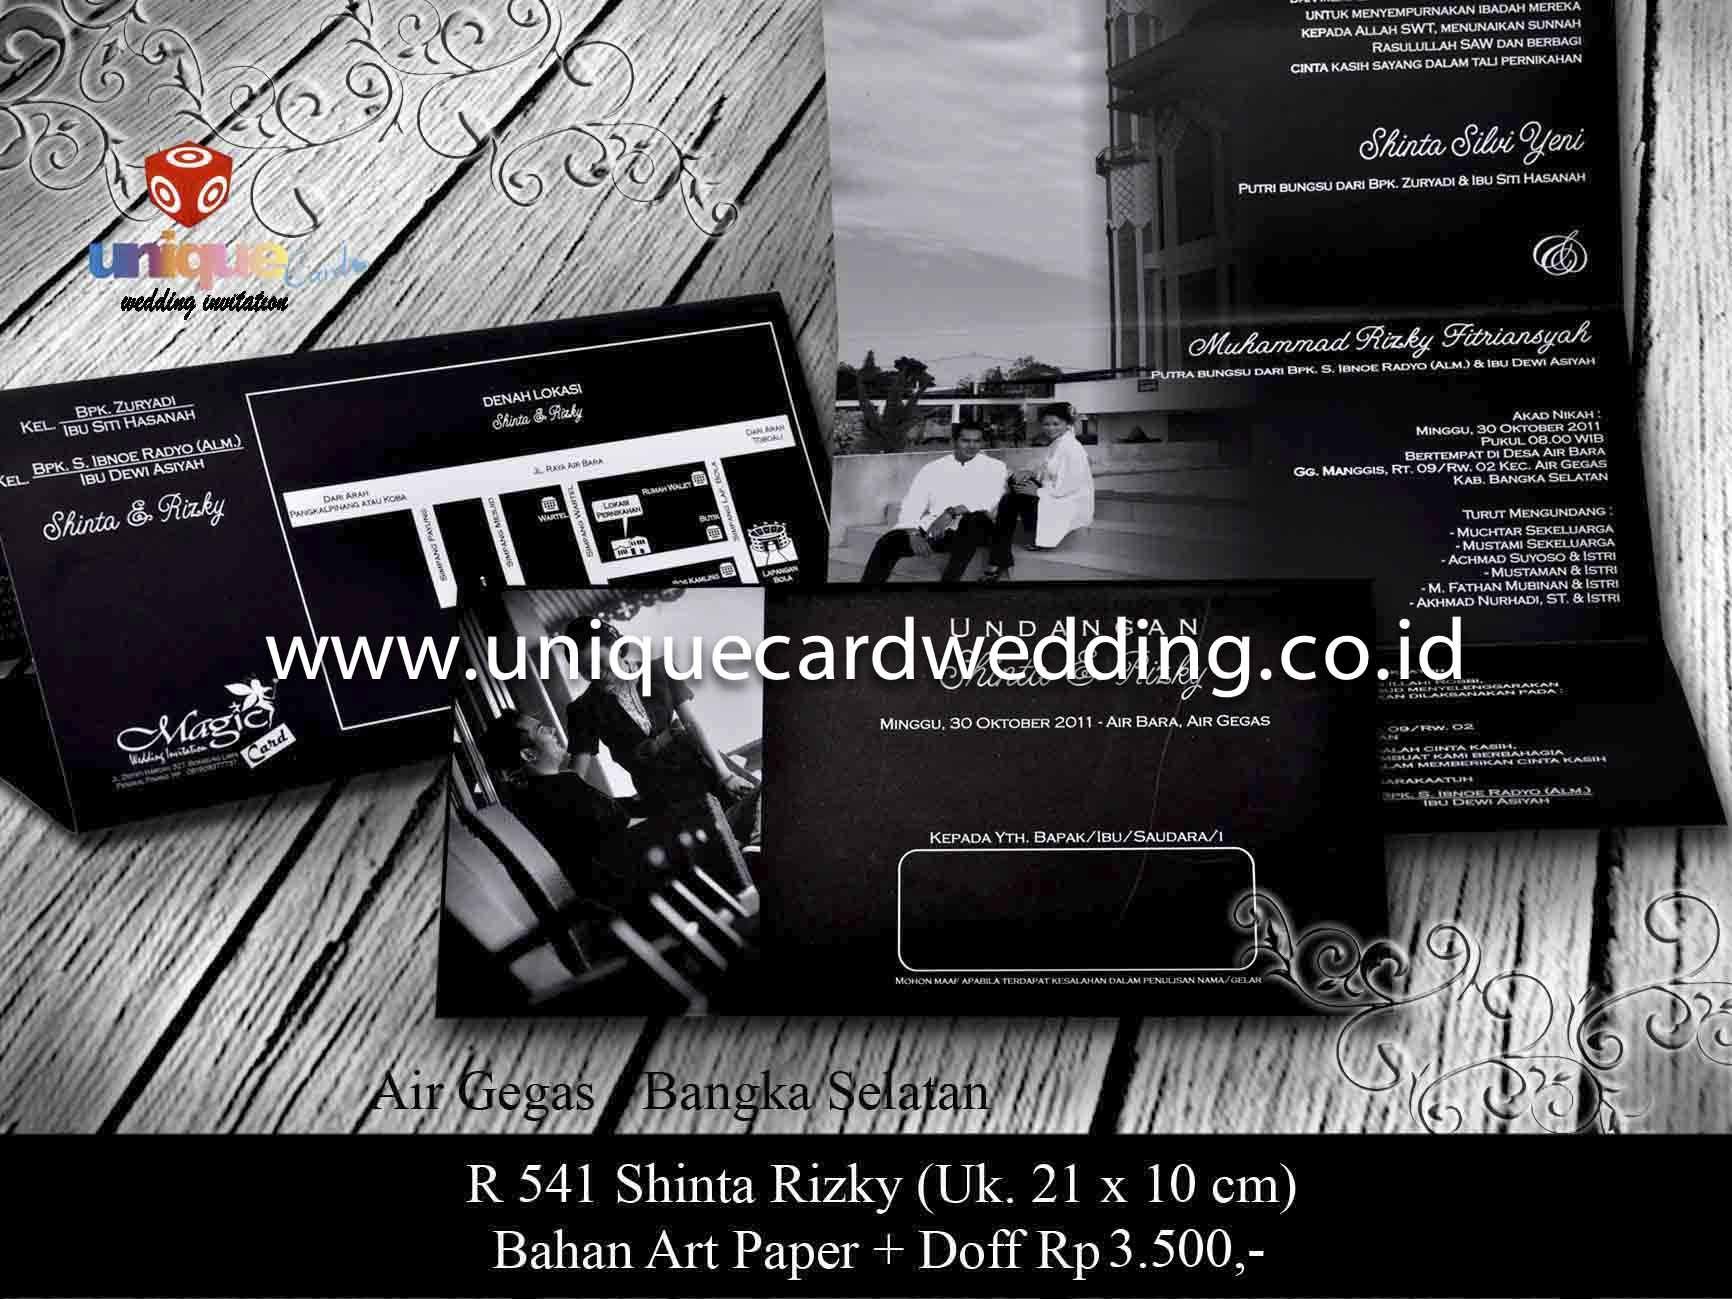 Undangan Pernikahan Unik Wedding Invitations Undangan Pernikahan Contoh Undangan Pernikahan Pernikahan Unik